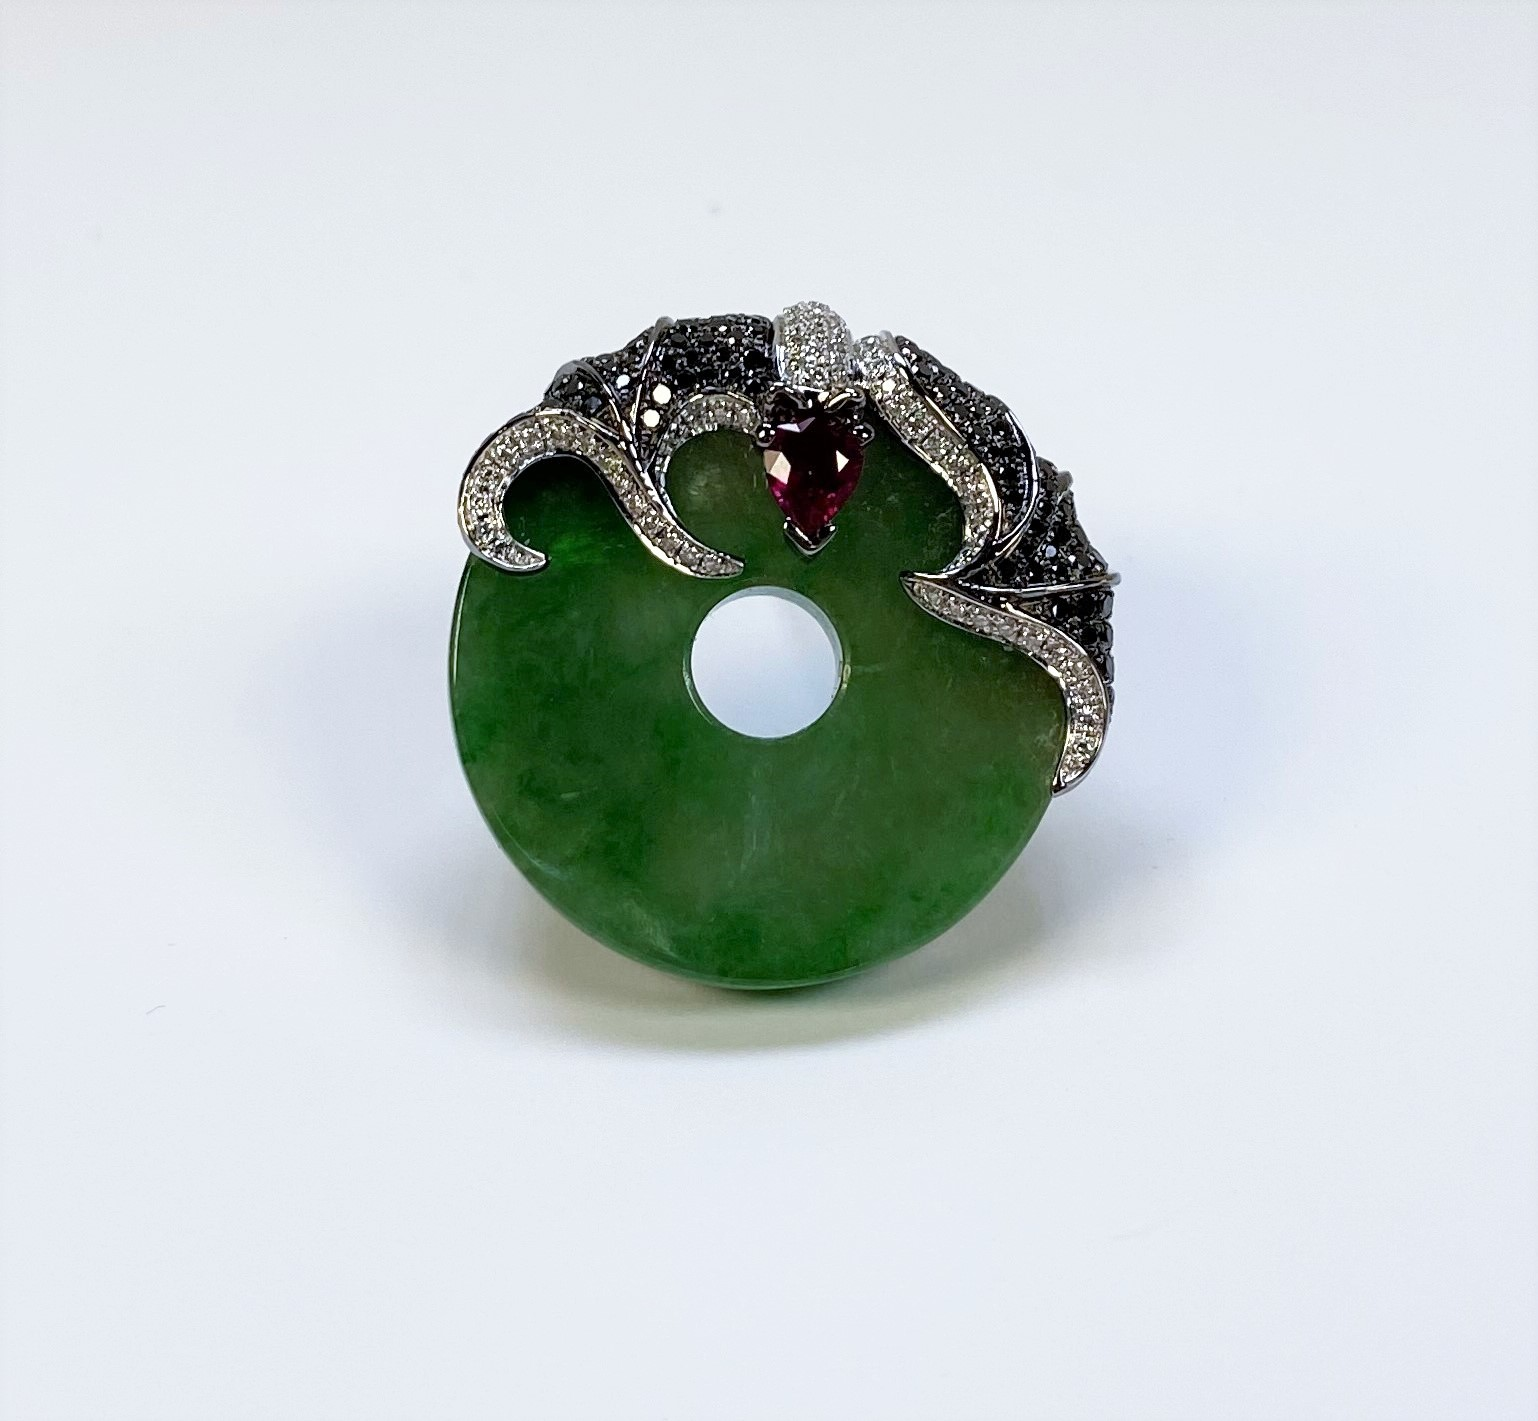 Bat Design Jade Diamond Pendant Brooch